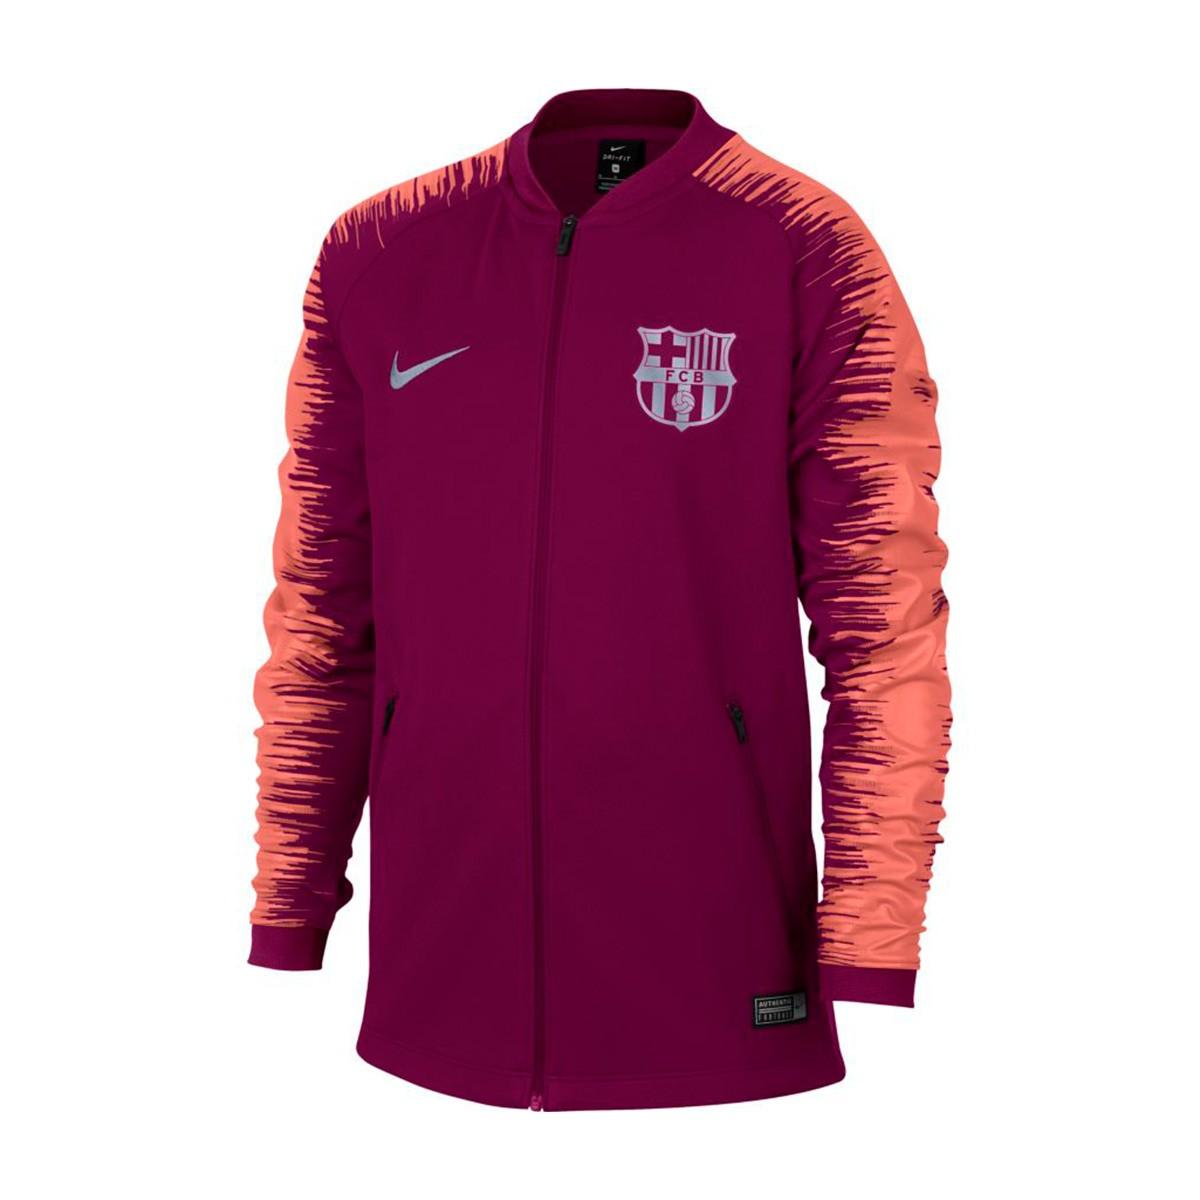 dafef2acfd9a3 Chamarra Nike FC Barcelona 2018-2019 Niño Deep maroon-Light atomic pink -  Tienda de fútbol Fútbol Emotion